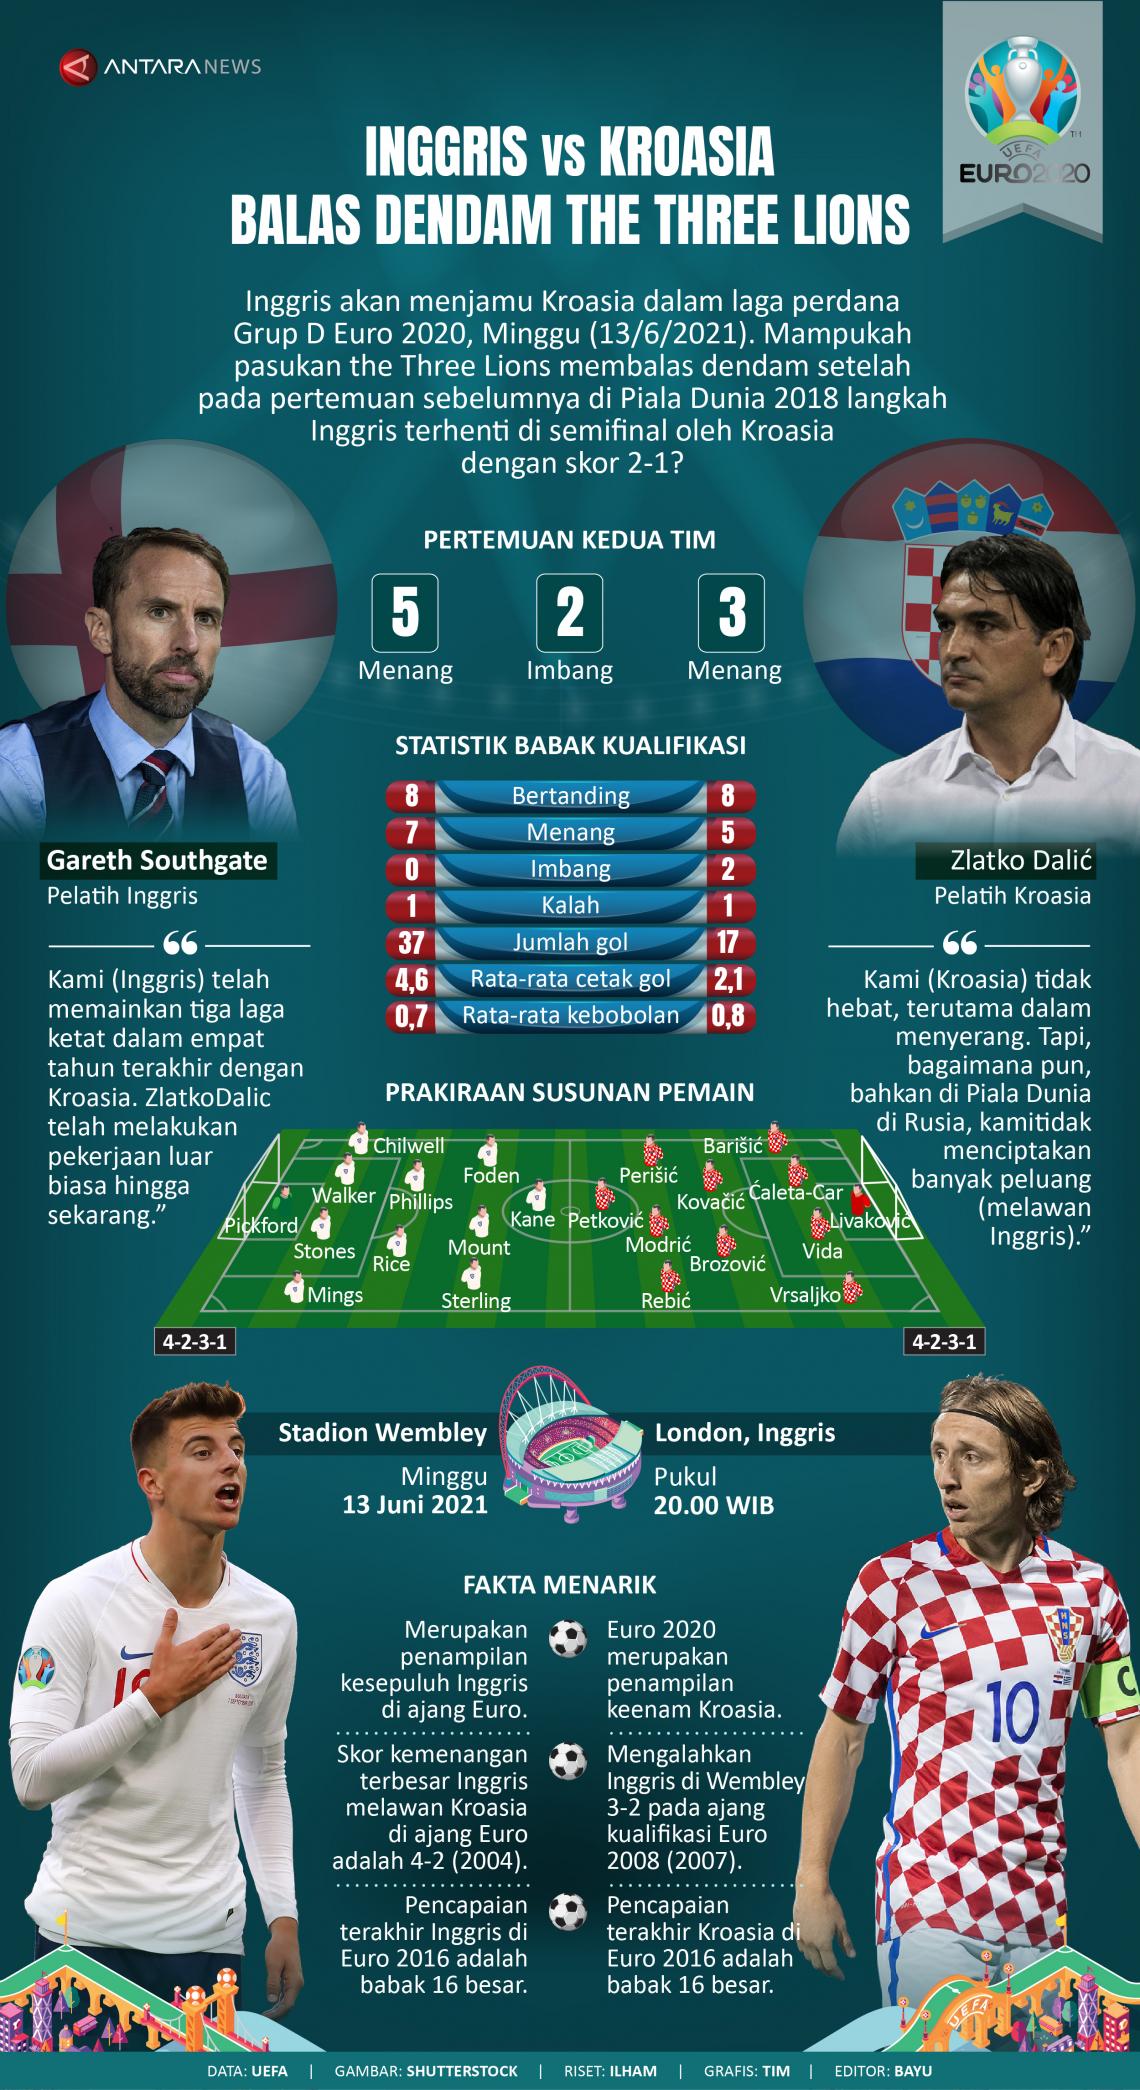 Inggris vs Kroasia: Balas dendam The Three Lions